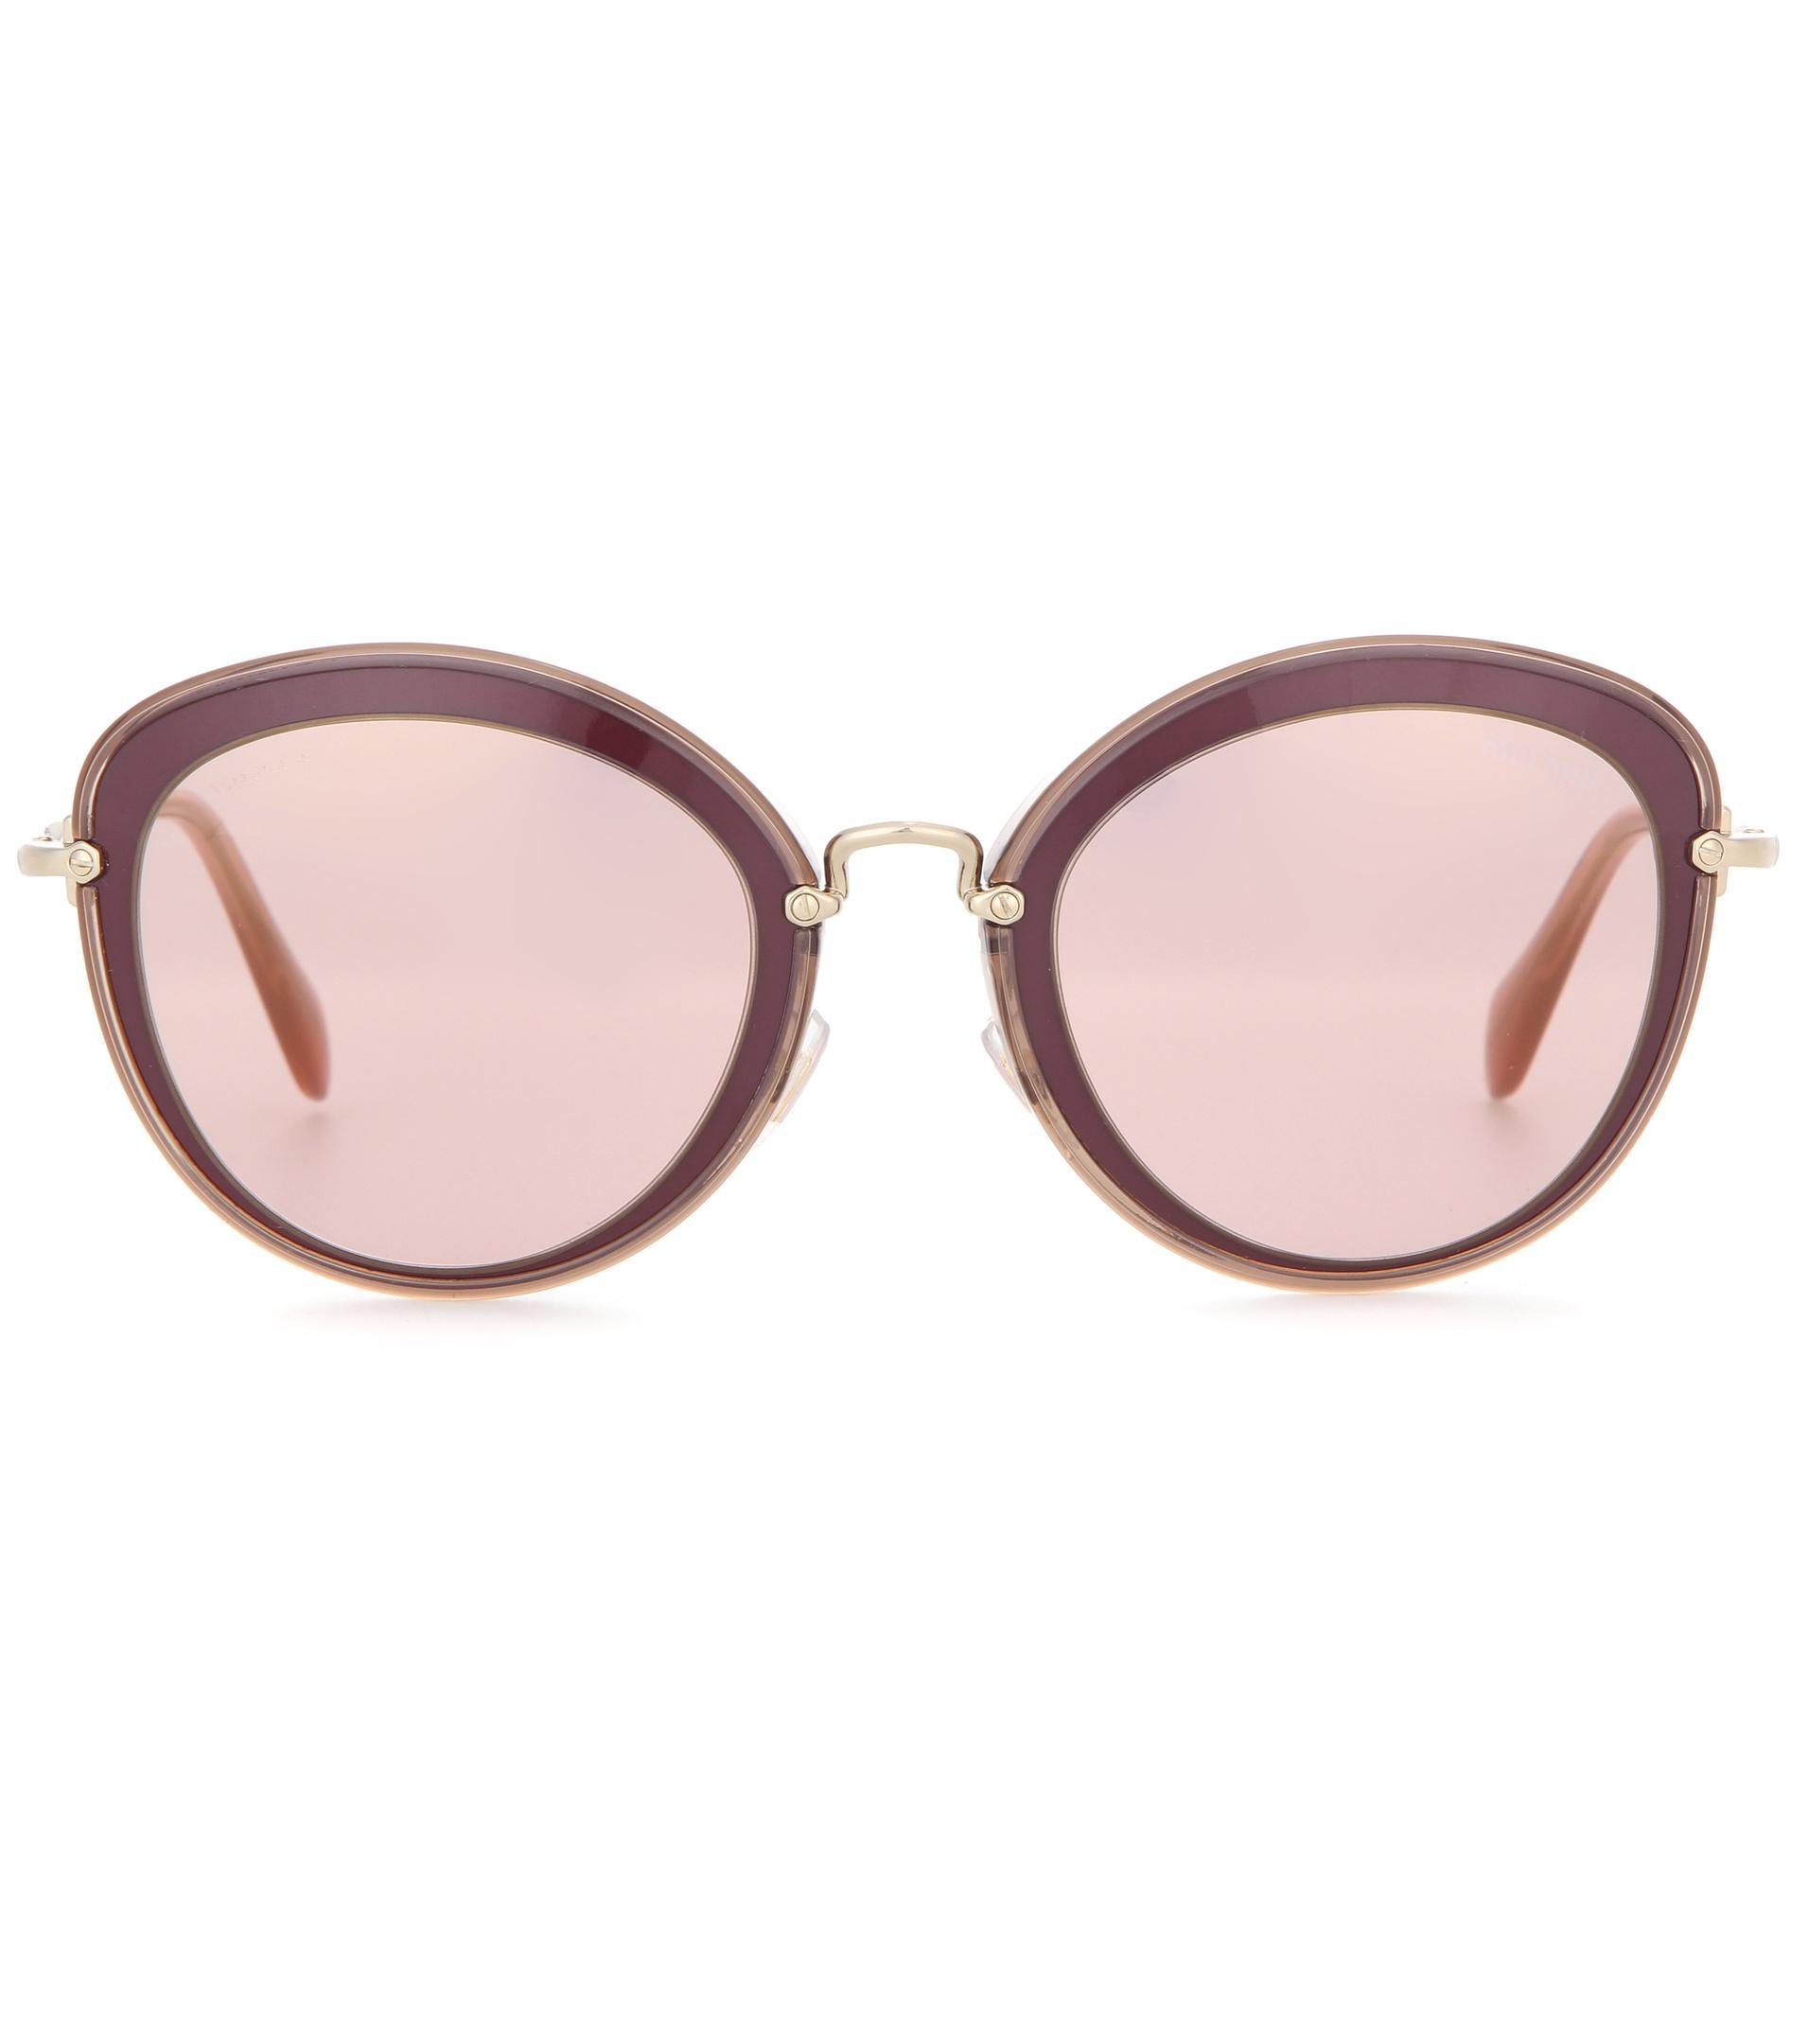 fd8bfbba98253 Miu Miu Red Glasses